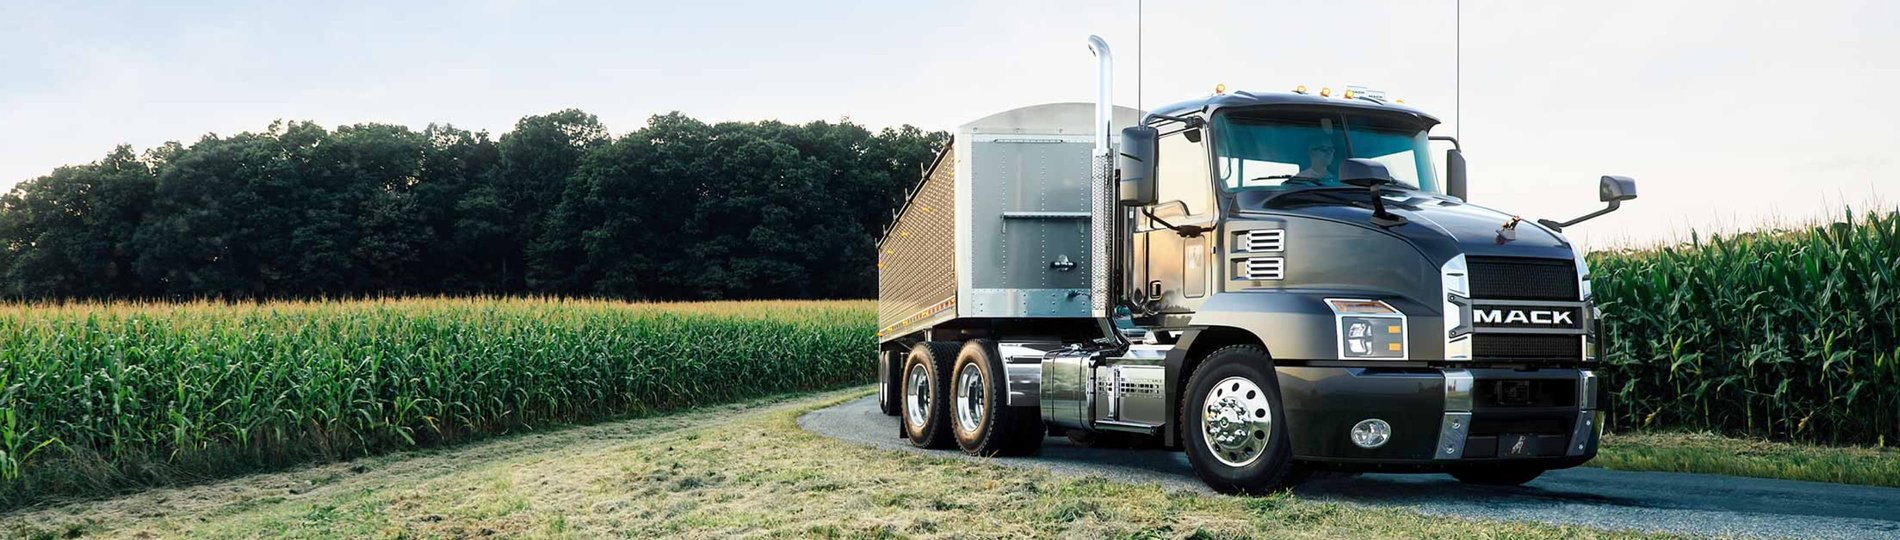 Mack powered trucks come Verizon Connect ready